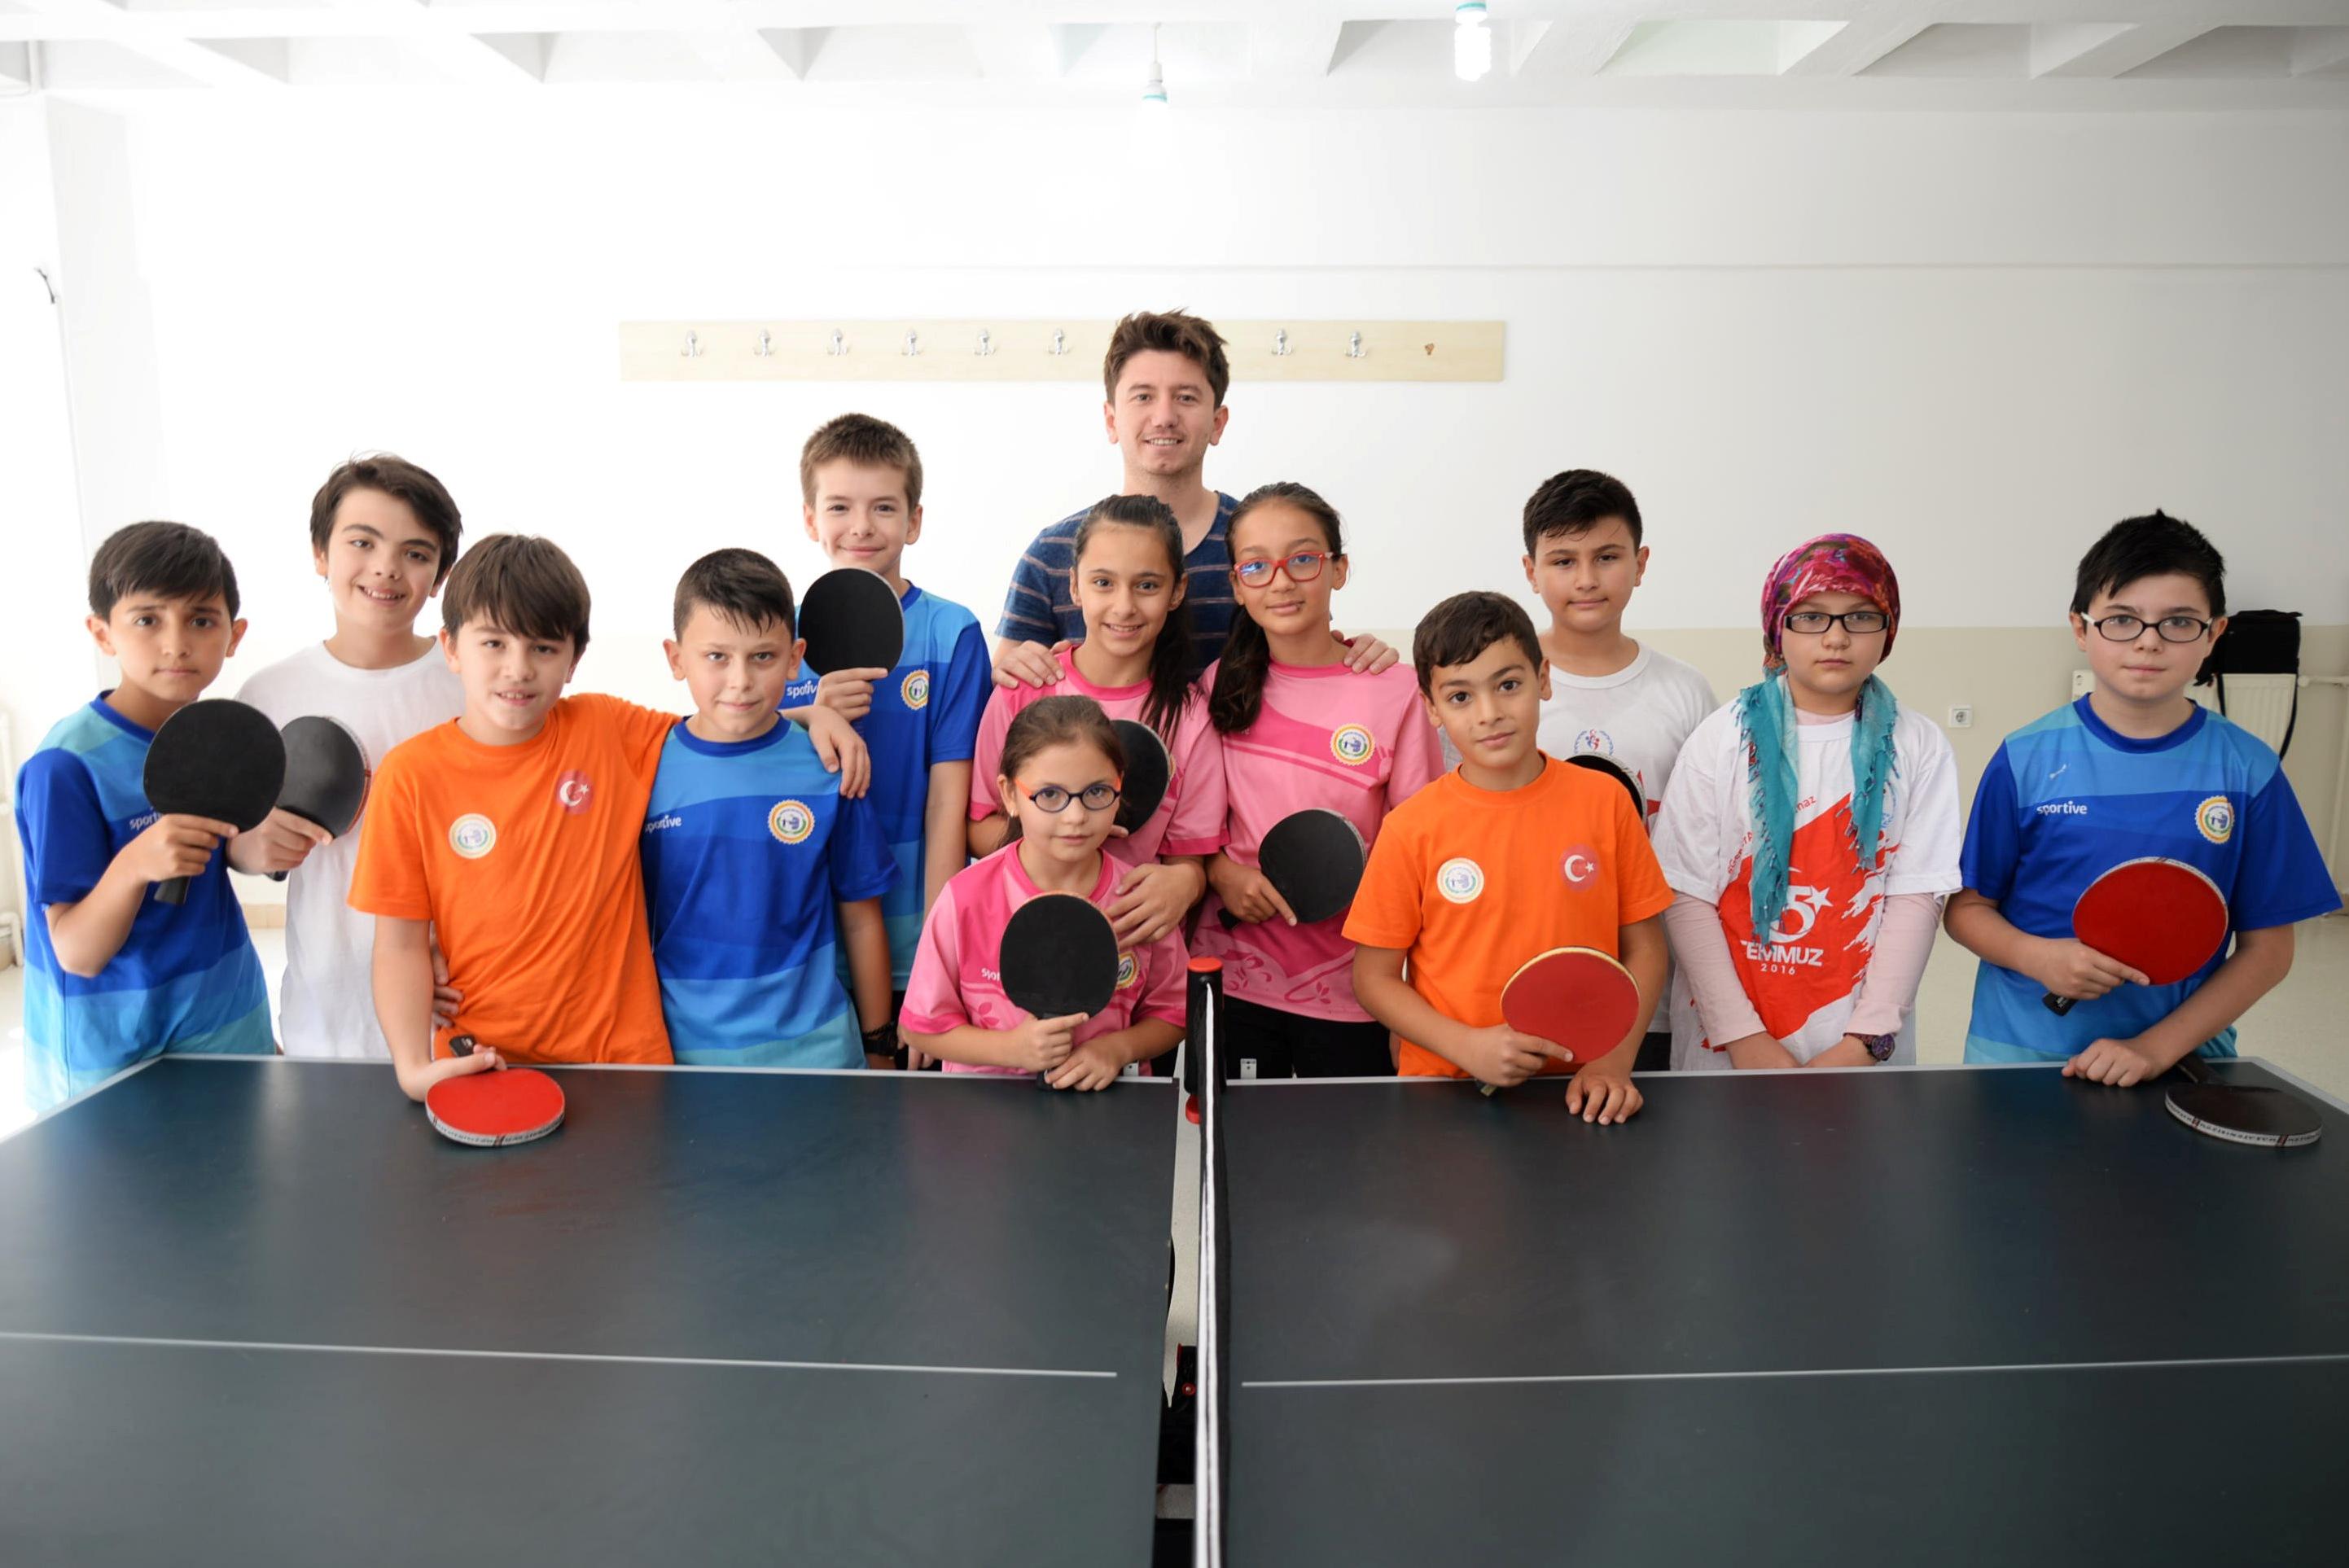 masa-tenisi-turnuvaya-hazirlik-1-(1).jpg